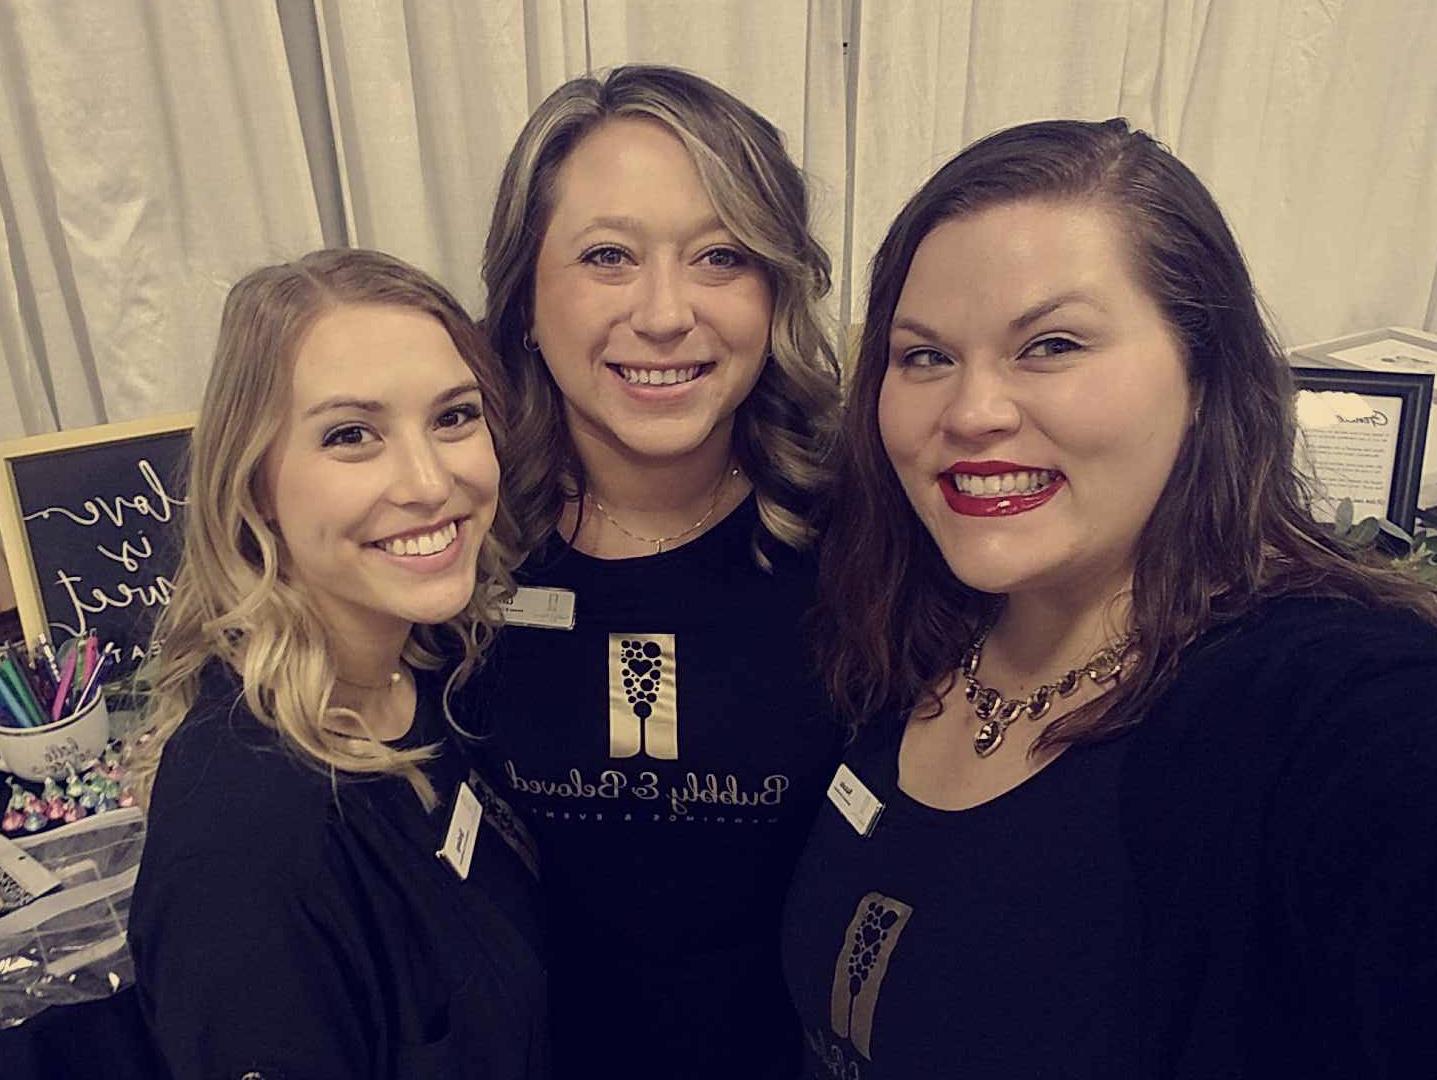 (From left to right) Lindsay: Assistant & Coordinator, Corrie: Owner & Lead Coordinator, Natasha: Assistant & Coordinator.